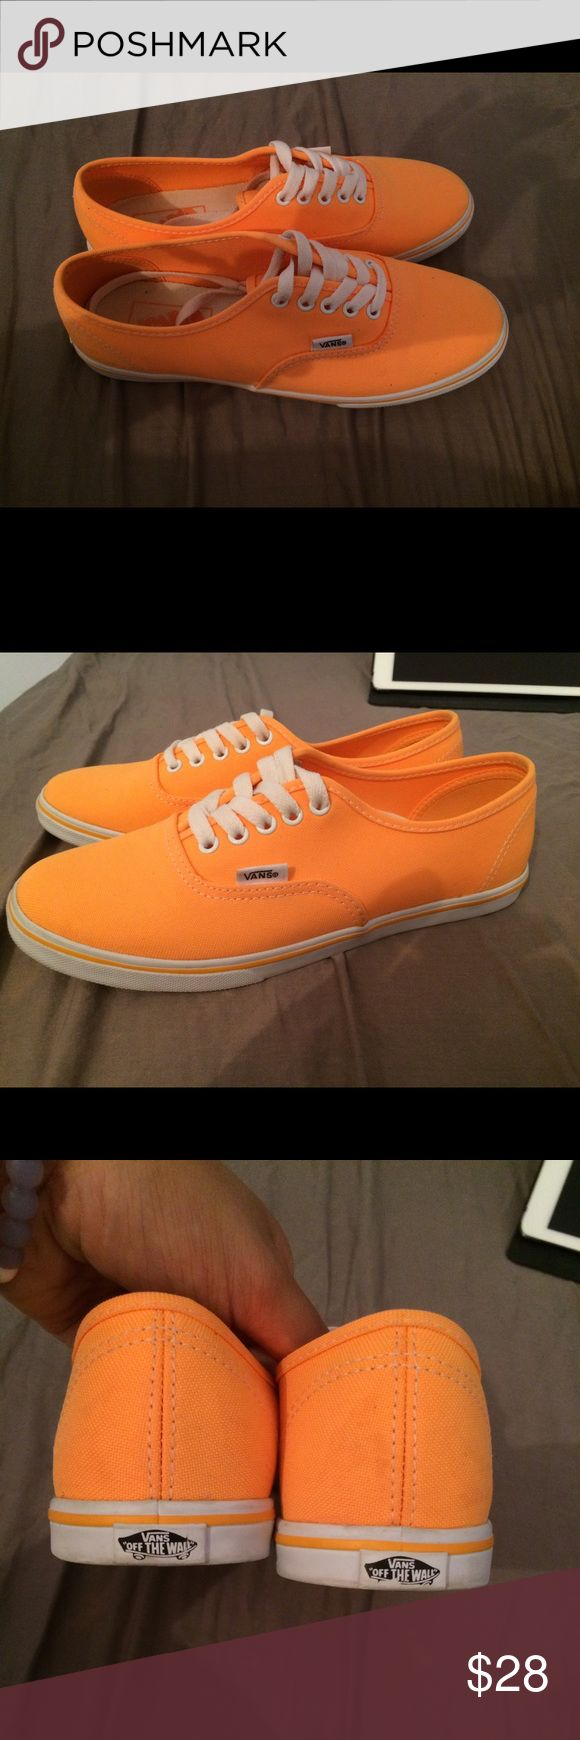 821d2d59a06b orange vans shoes   OFF42% Discounts